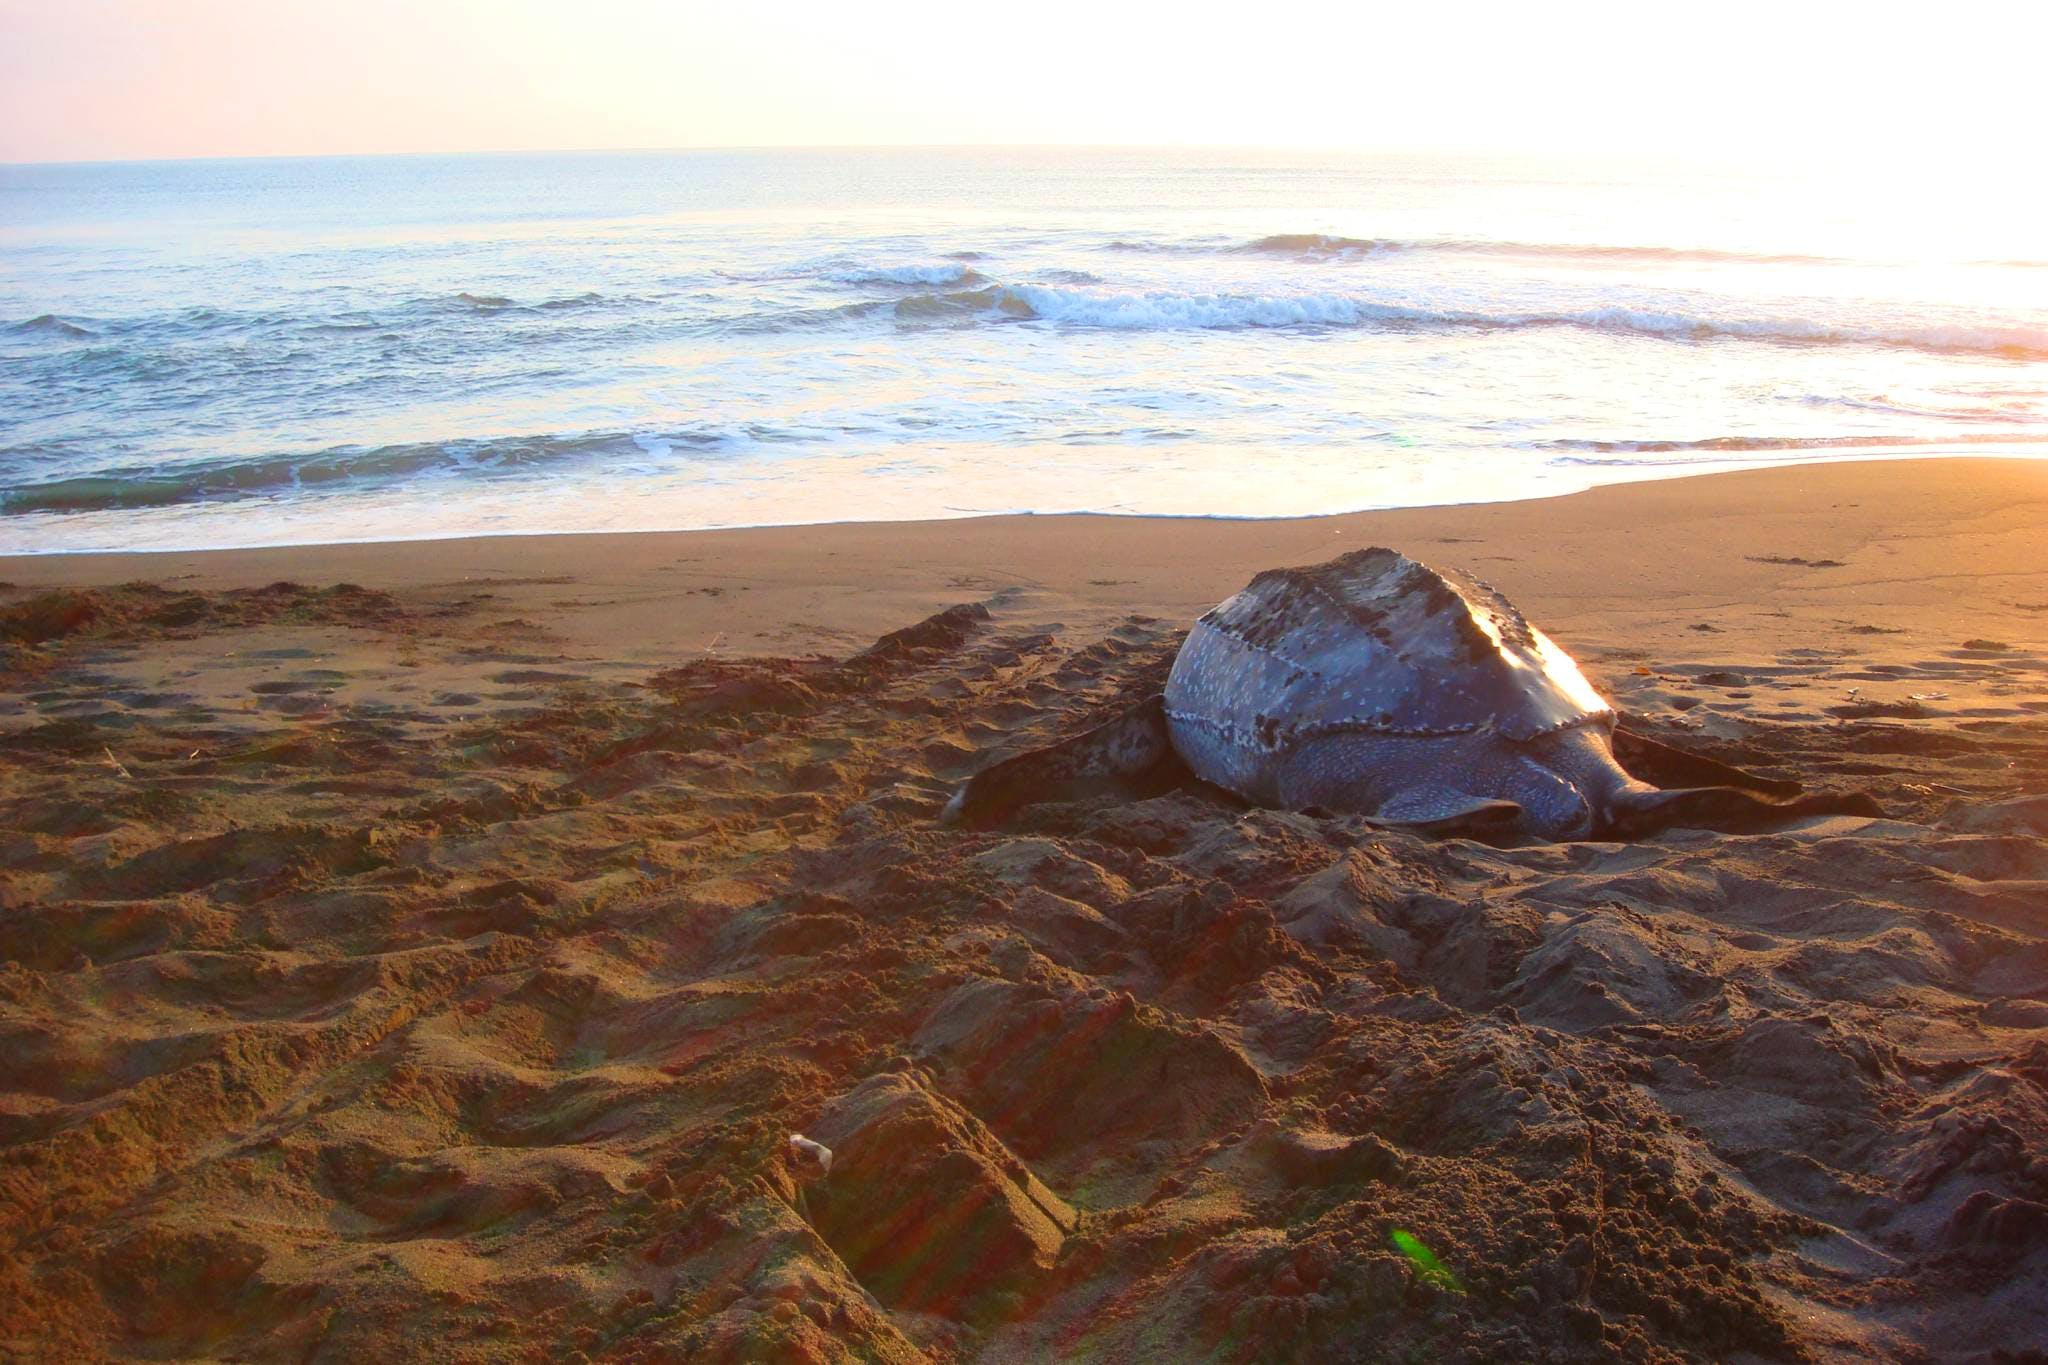 Leatherback Turtle Conservation